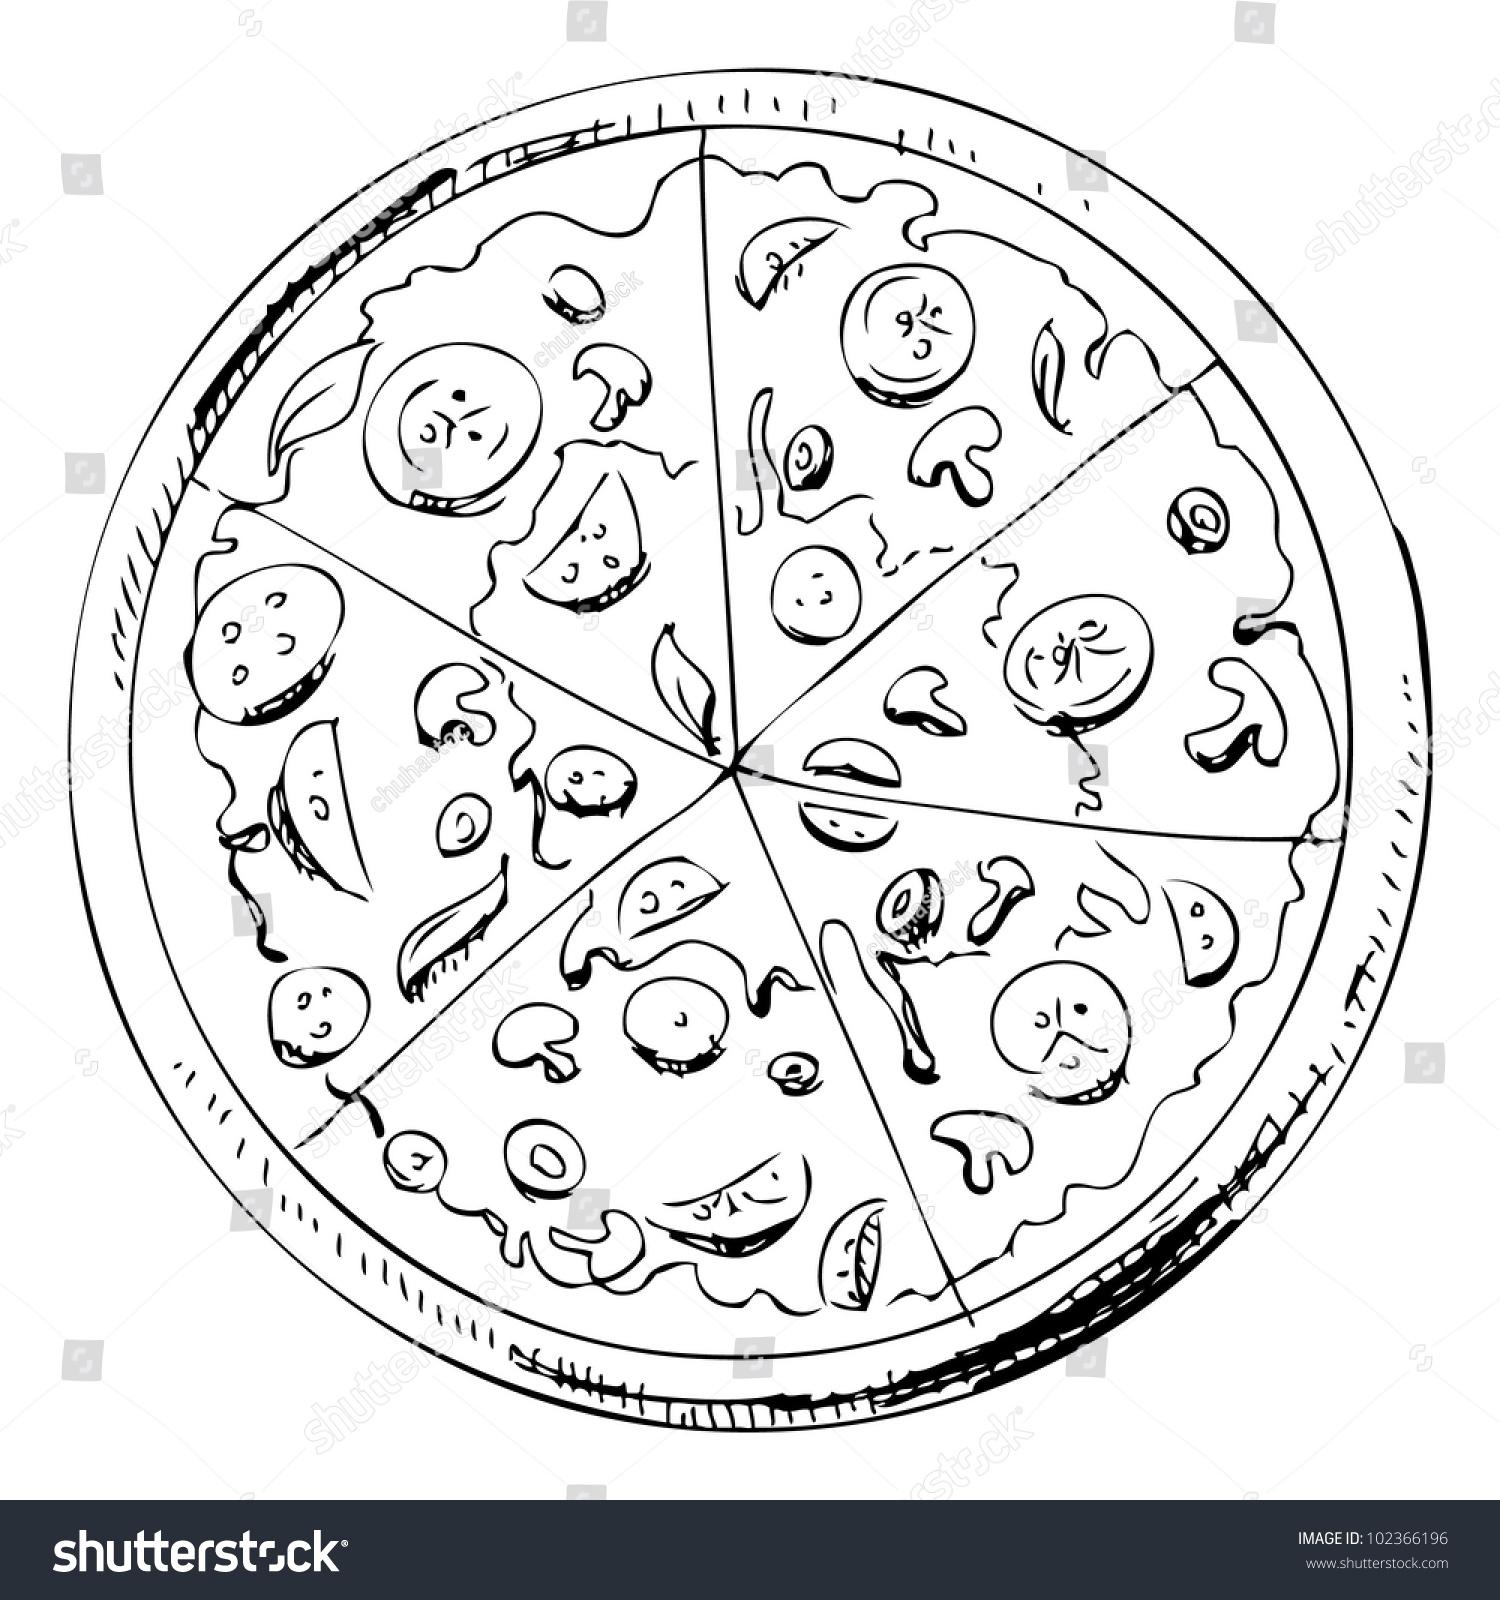 Sliced Pizza Isolated On White Background Stock Vector 102366196 - Shutterstock